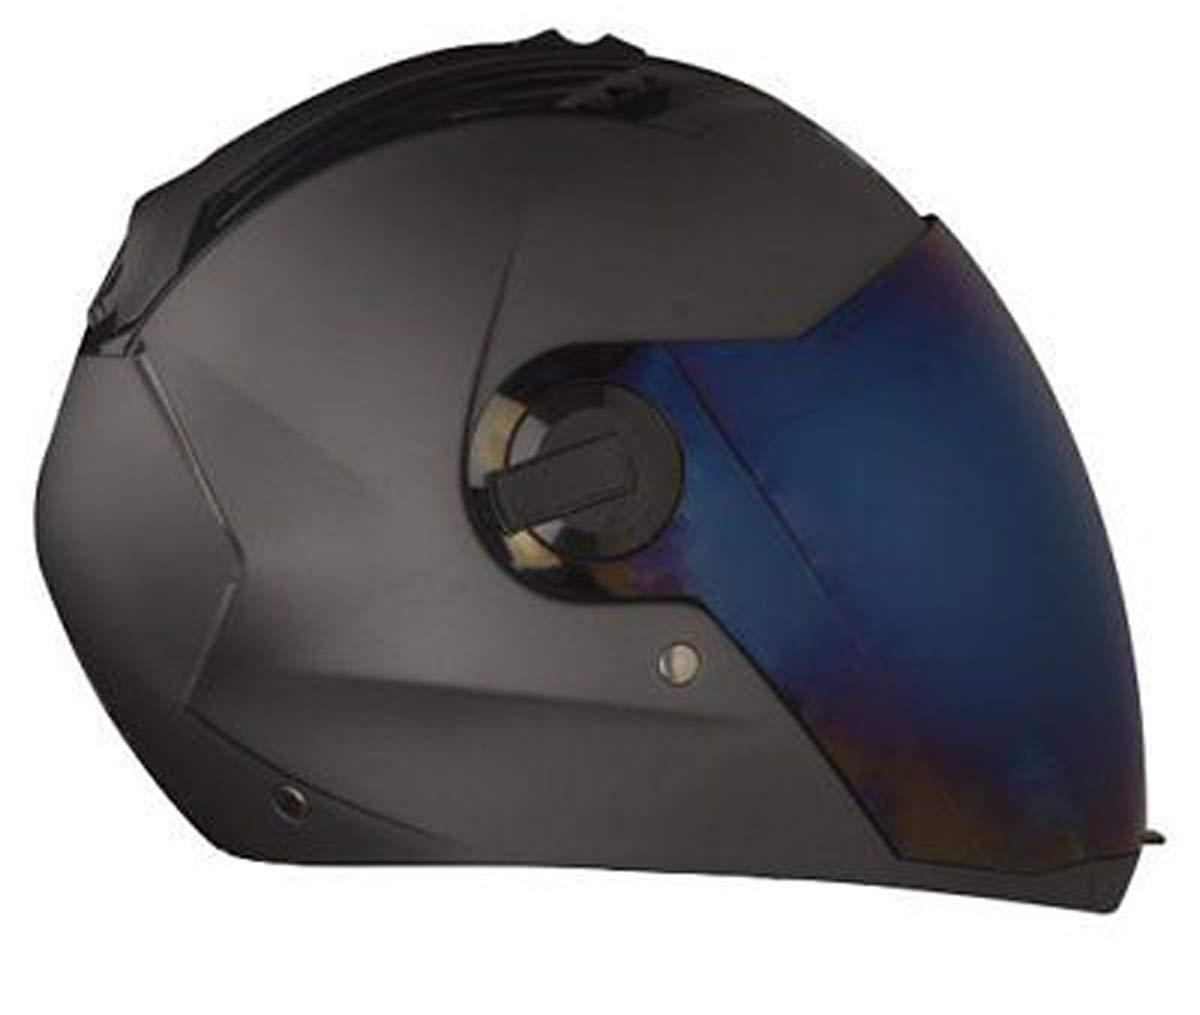 Steelbird Multi Color Choice Air SBA-2 Full Face Motorbike Helmet 1 Extra Visor Scooter Motorcycle Motorbike Helmets